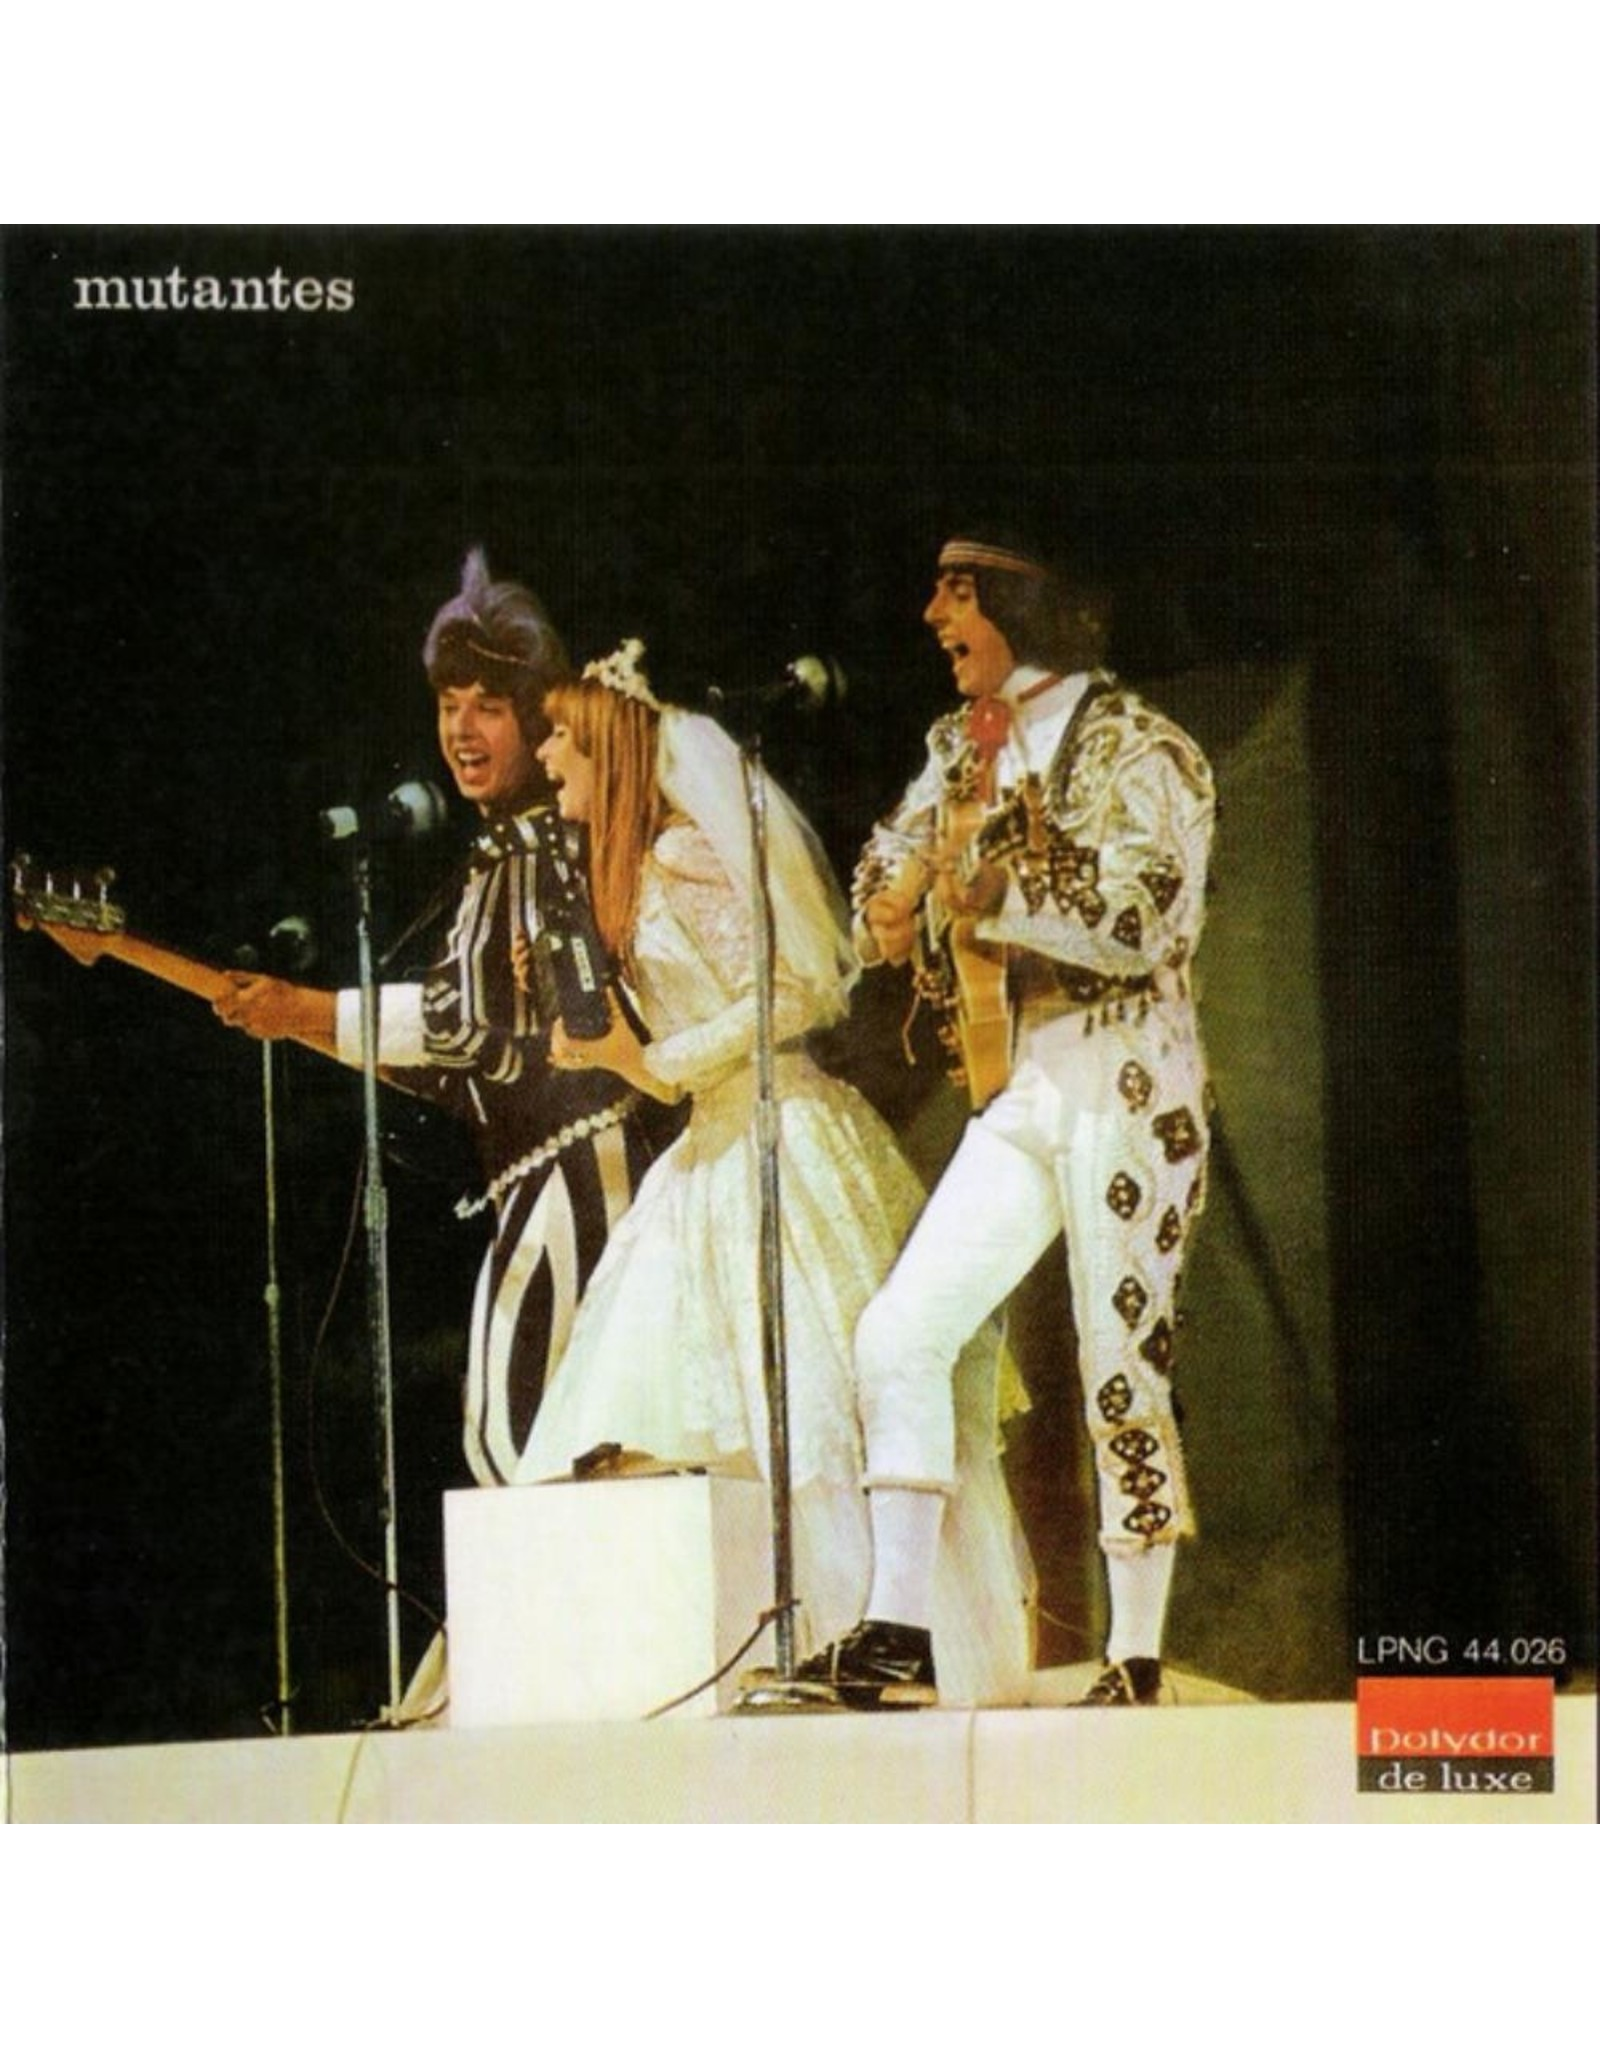 New Vinyl Os Mutantes - Mutantes (180g, Colored) LP